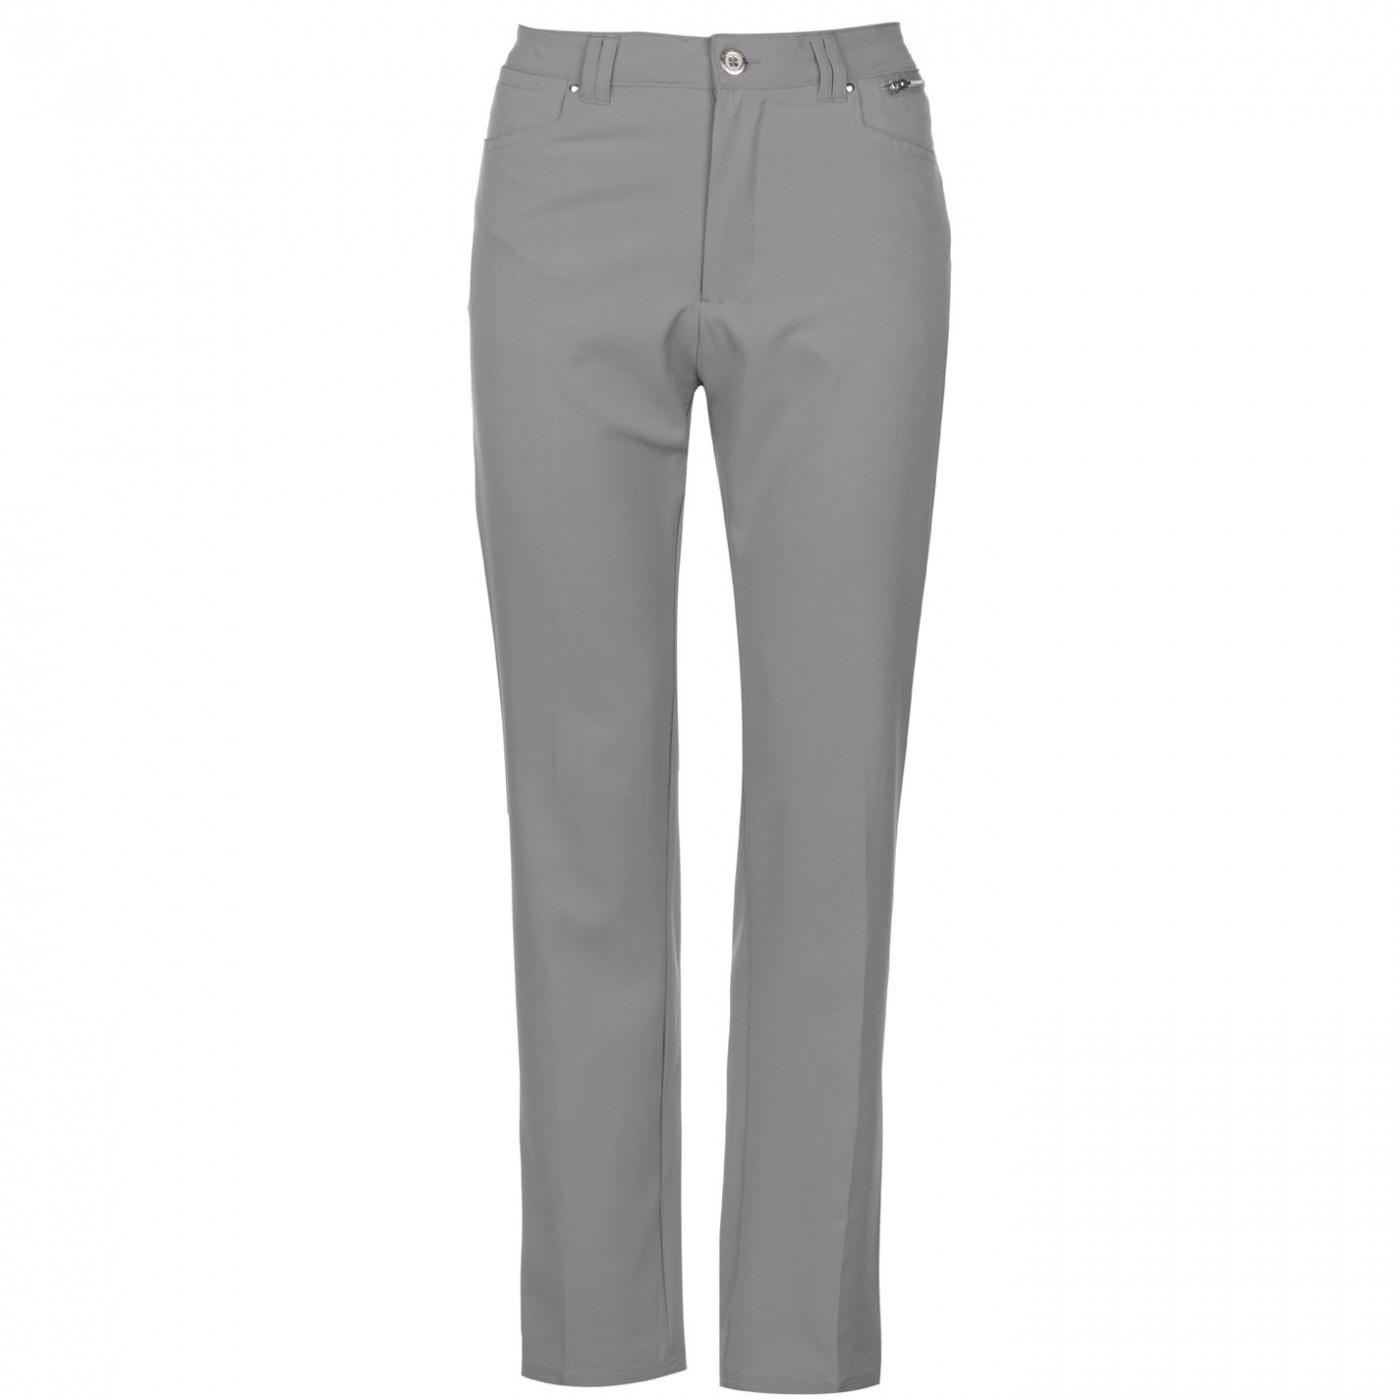 Slazenger Golf Trousers Ladies